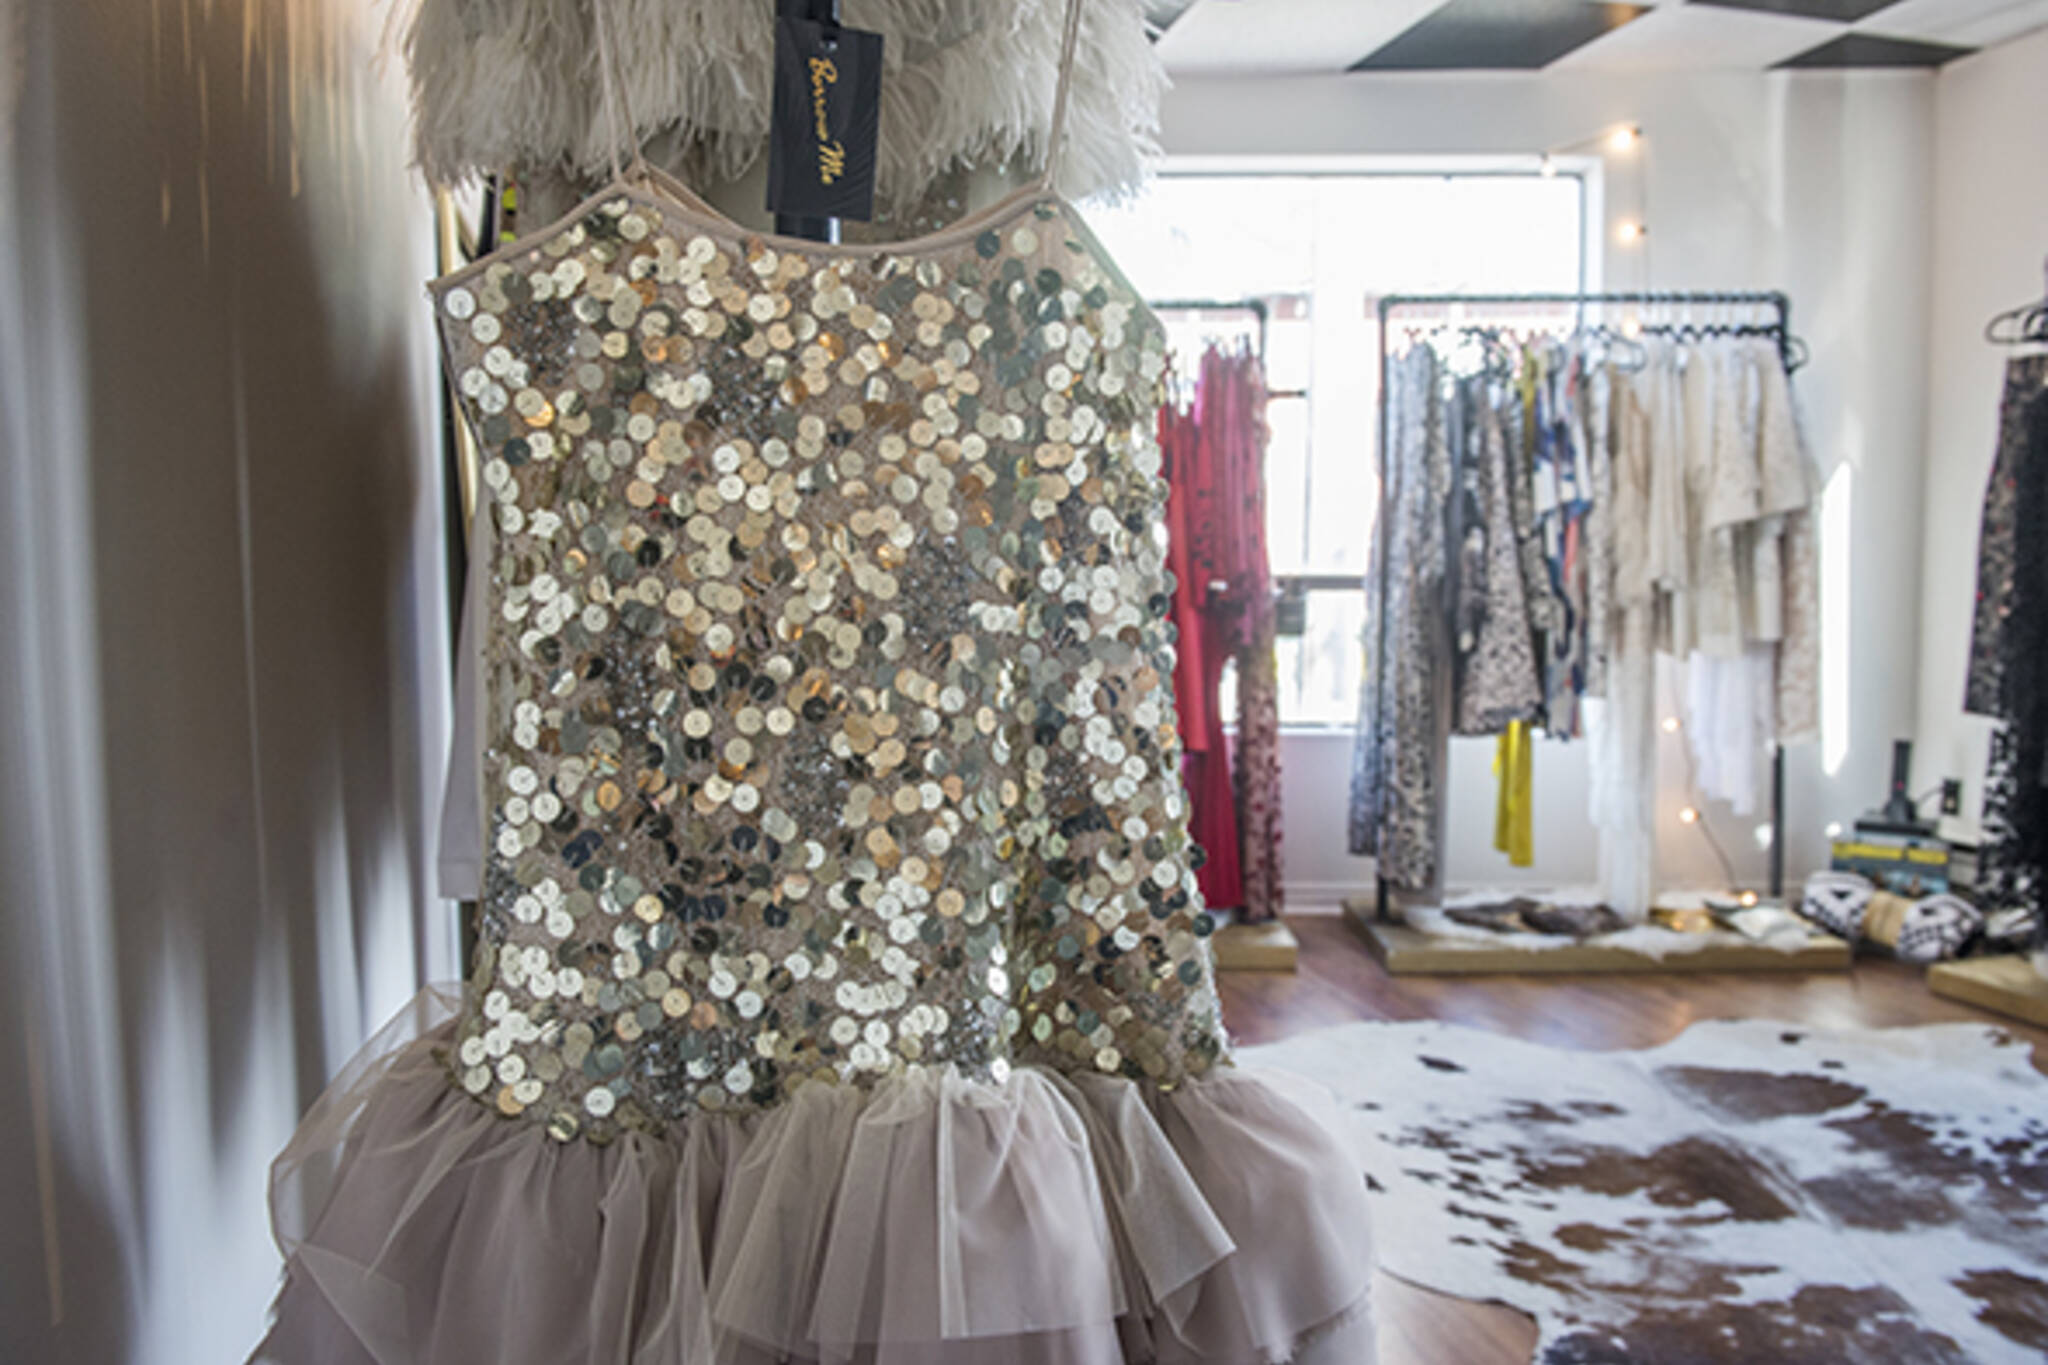 Rent designer dresses for cheap at new Toronto studio